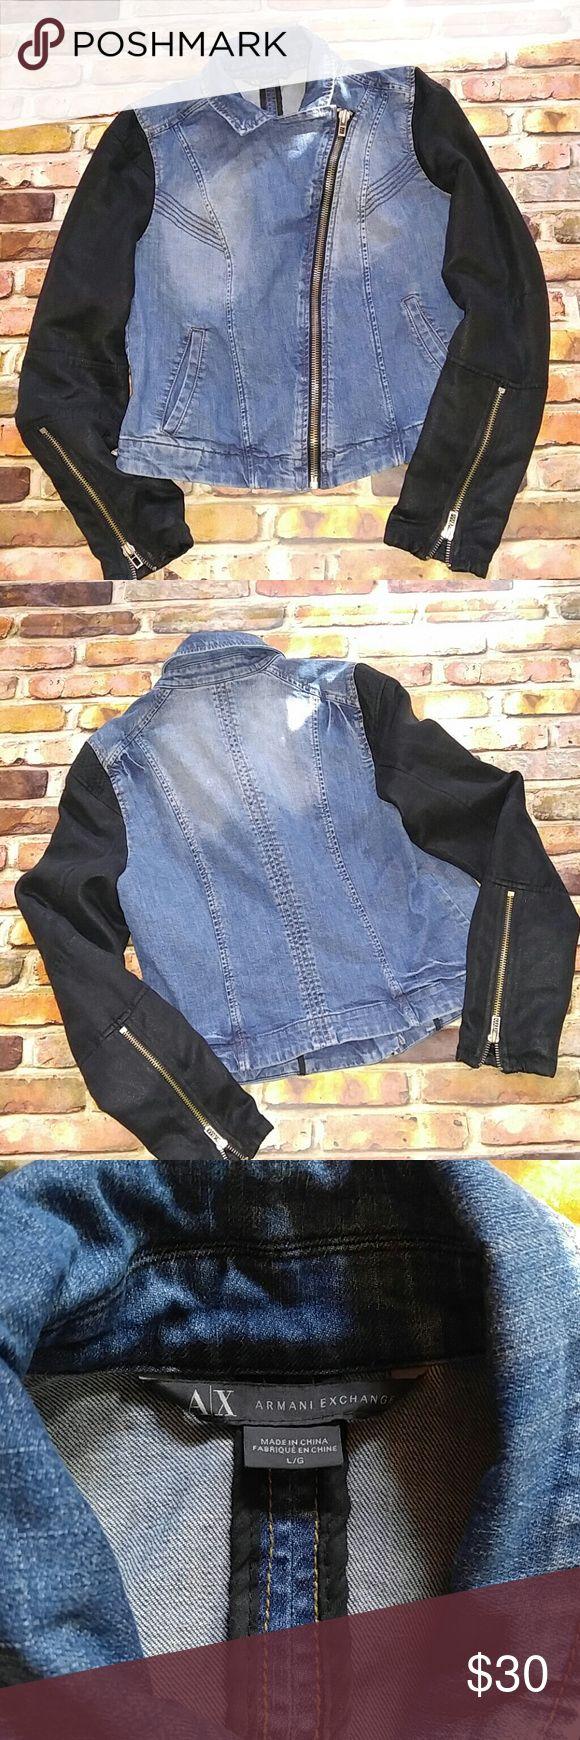 Armani Exchange denim Moto biker Jacket XL Very good condition.  Be sure to look at measurements carefully A/X Armani Exchange Jackets & Coats Jean Jackets